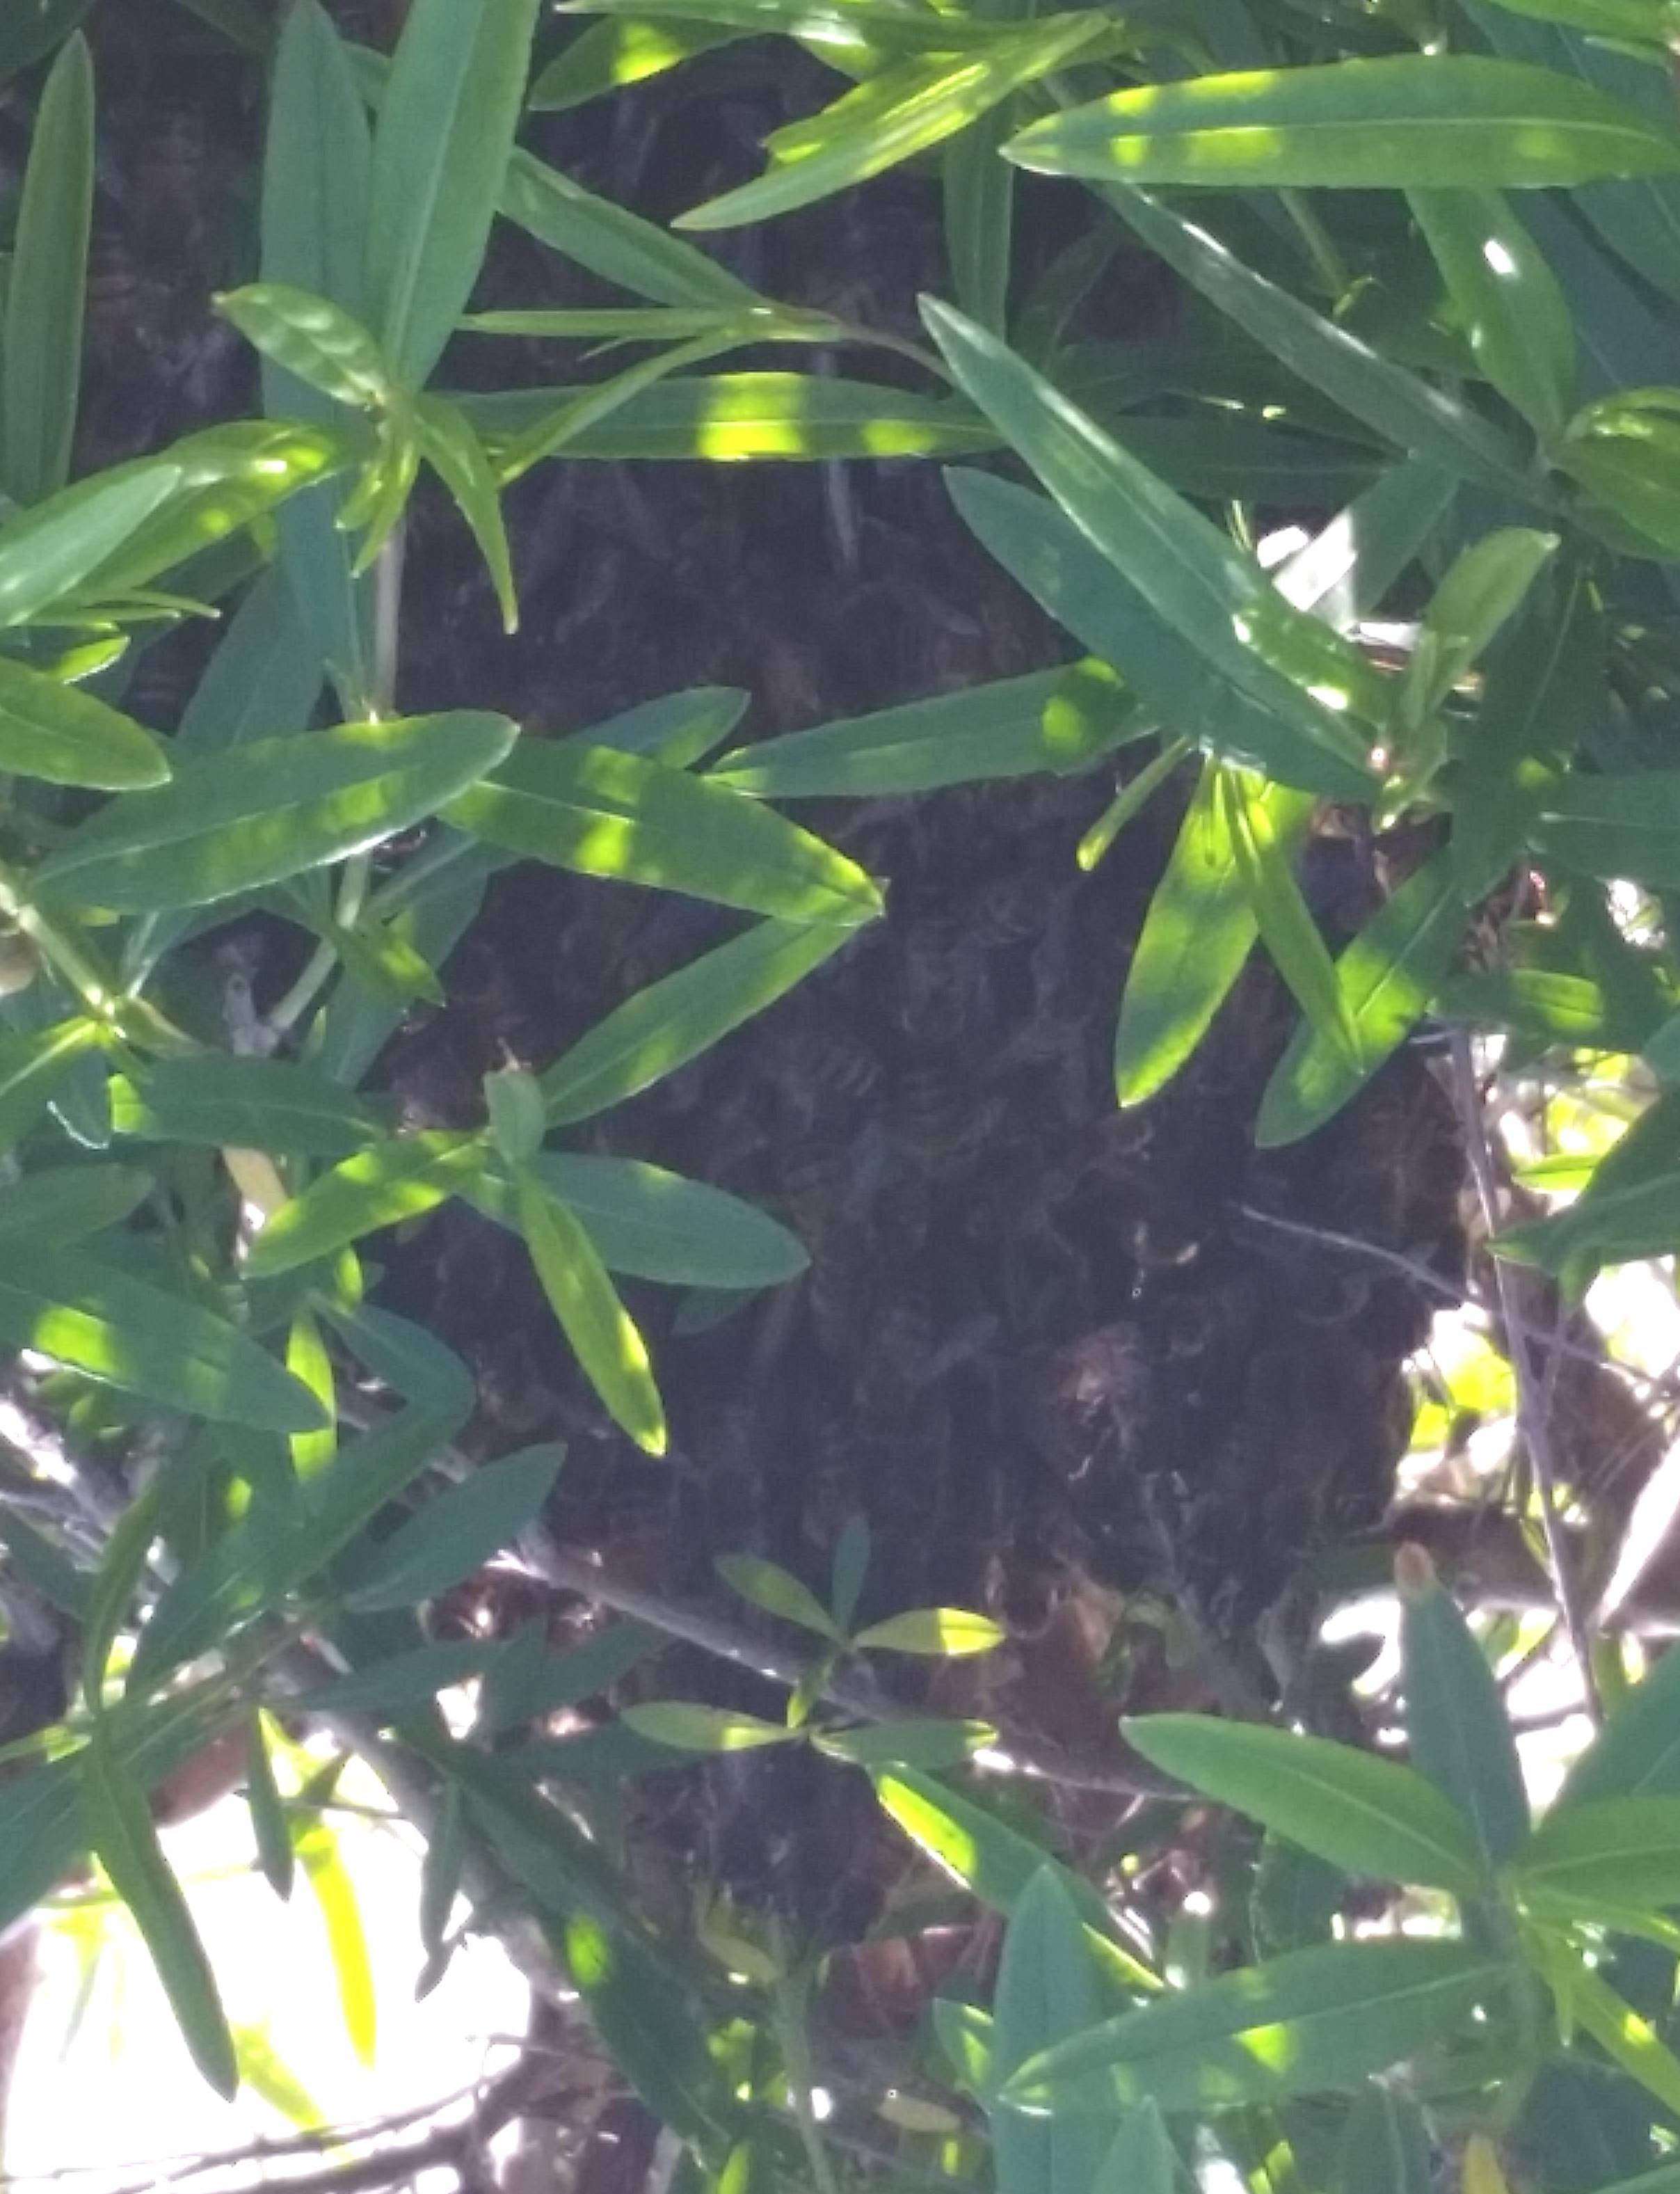 Honey Bee Swarm in a bush.